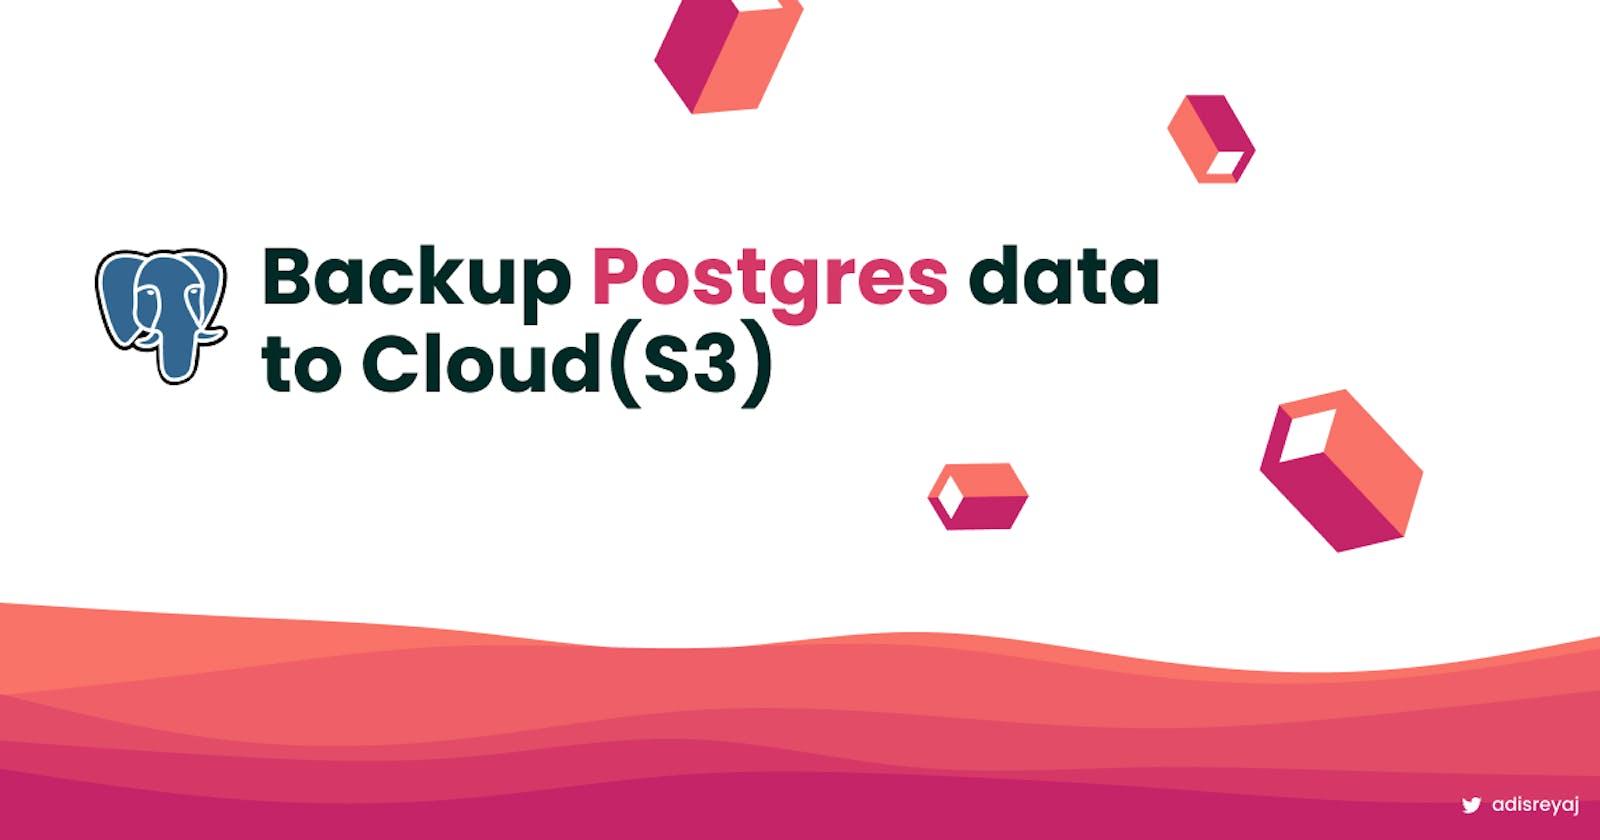 How to backup Postgres data to S3 Bucket using Minio